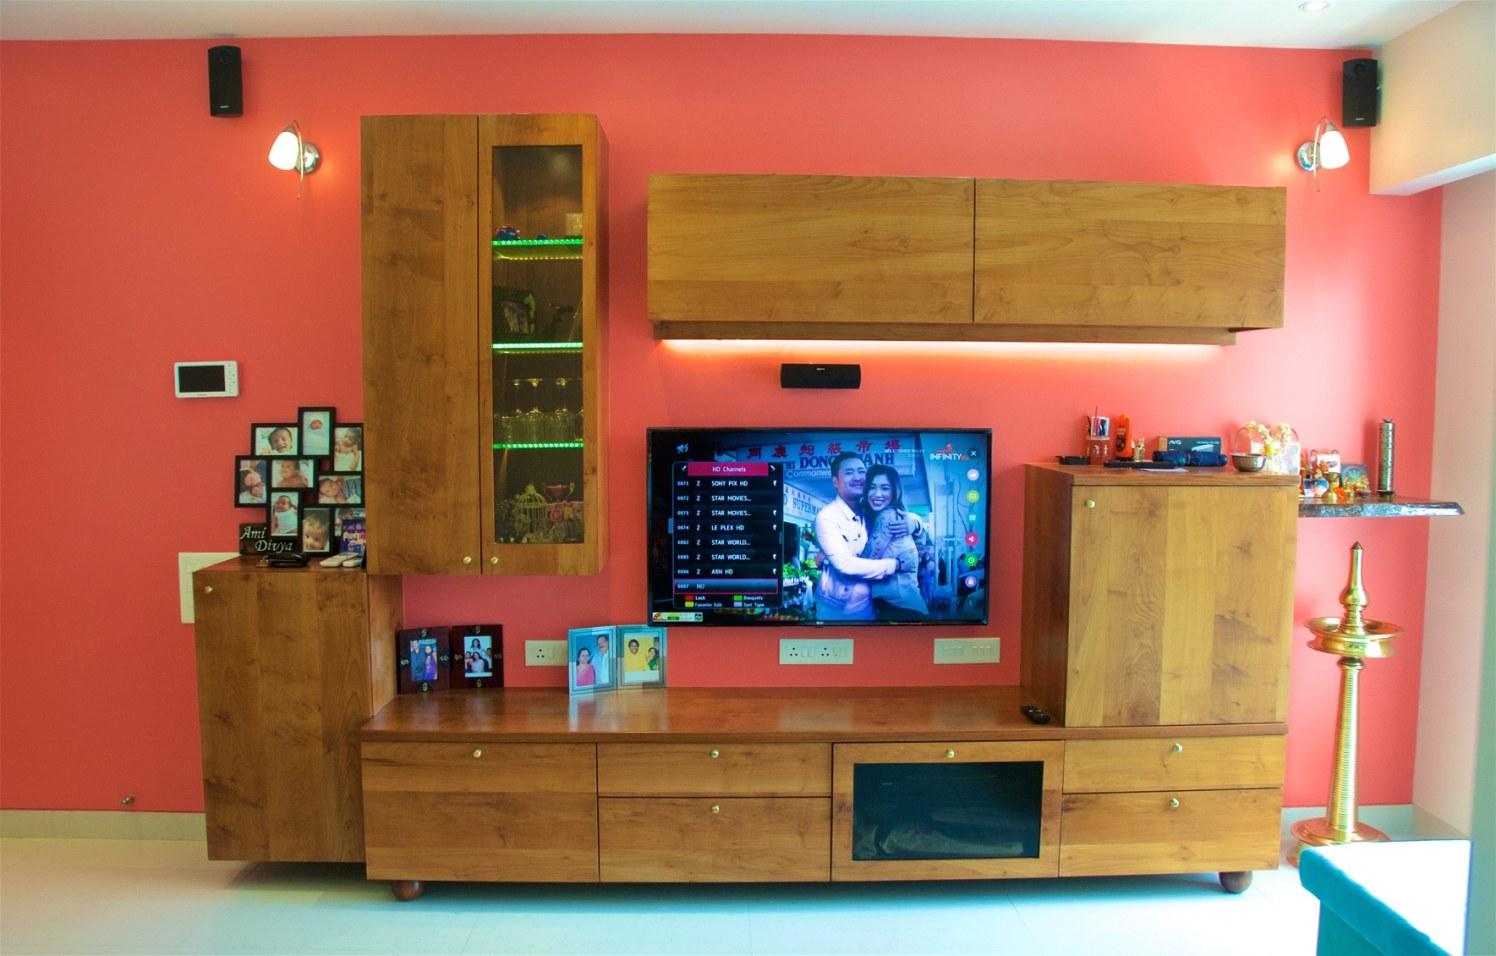 Wooden Tv Unit with Pink Wall by Viraf Laskari  Living-room Contemporary | Interior Design Photos & Ideas